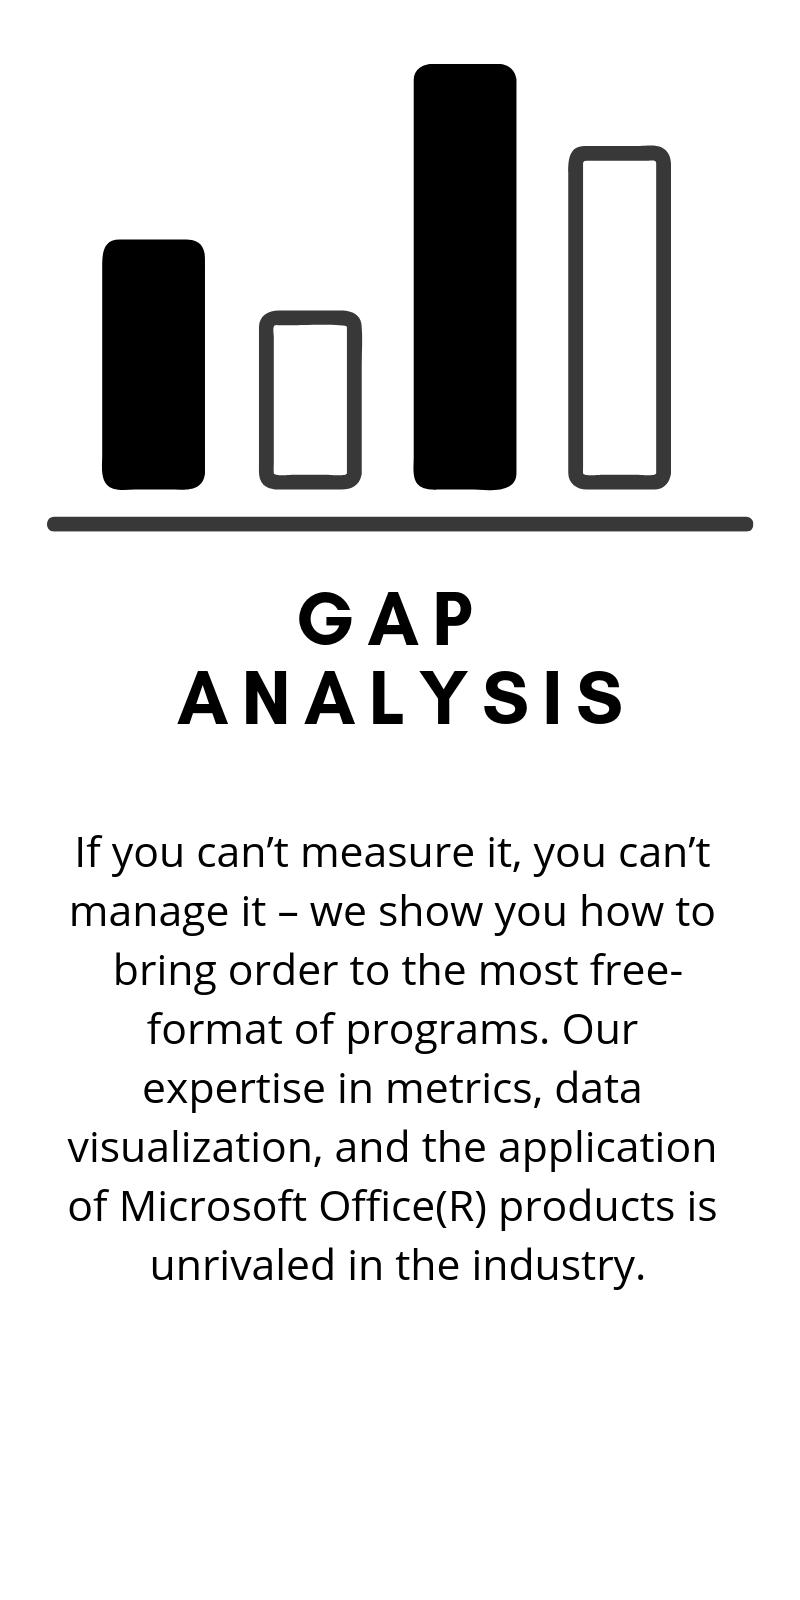 gap-analysis-performance-improvement.png